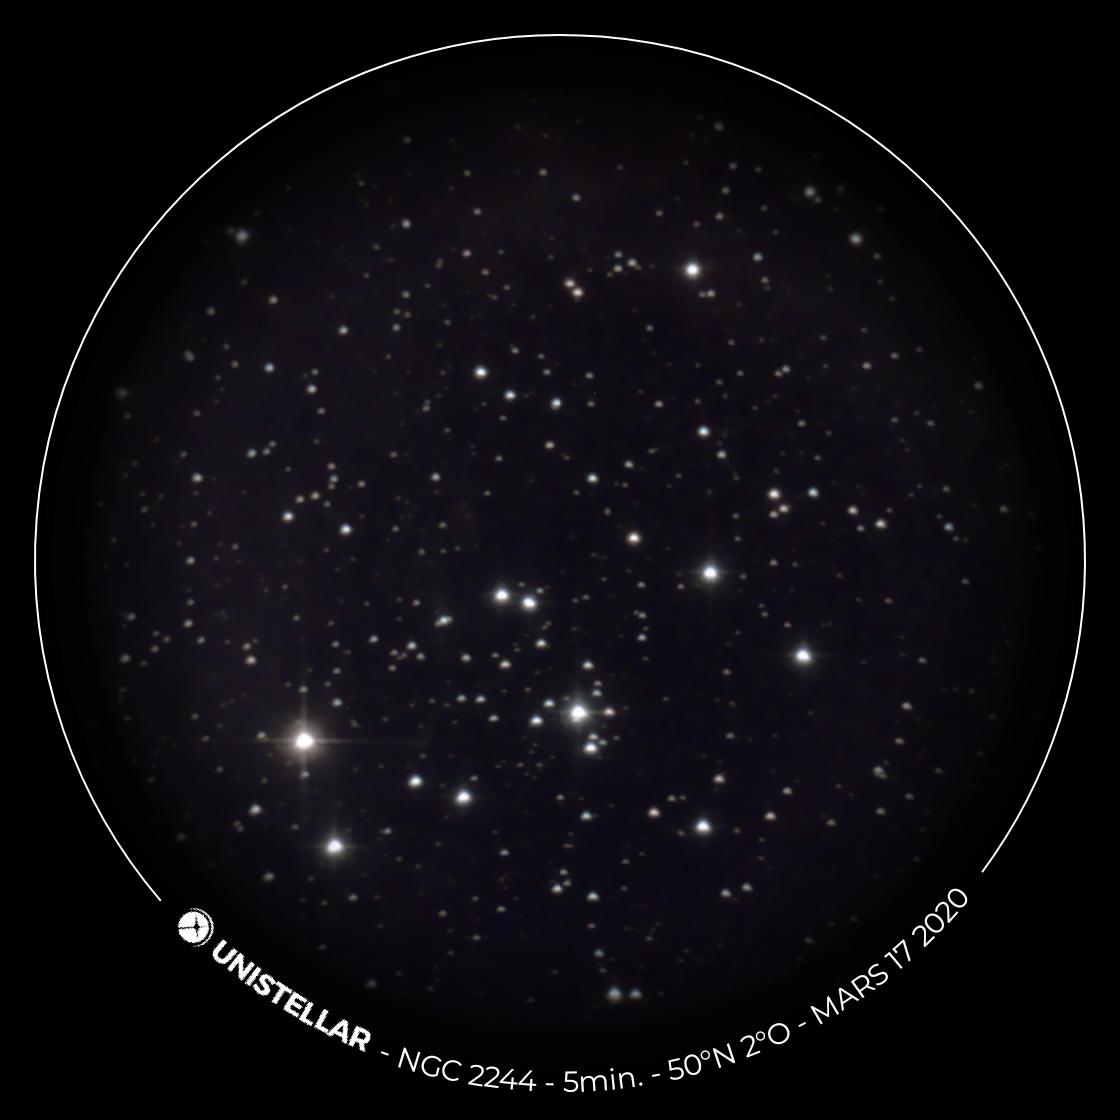 5e7223ce61f11_NGC224420200317-222906.png.093a4e6a097832b4f67f1fac246f5b39.png